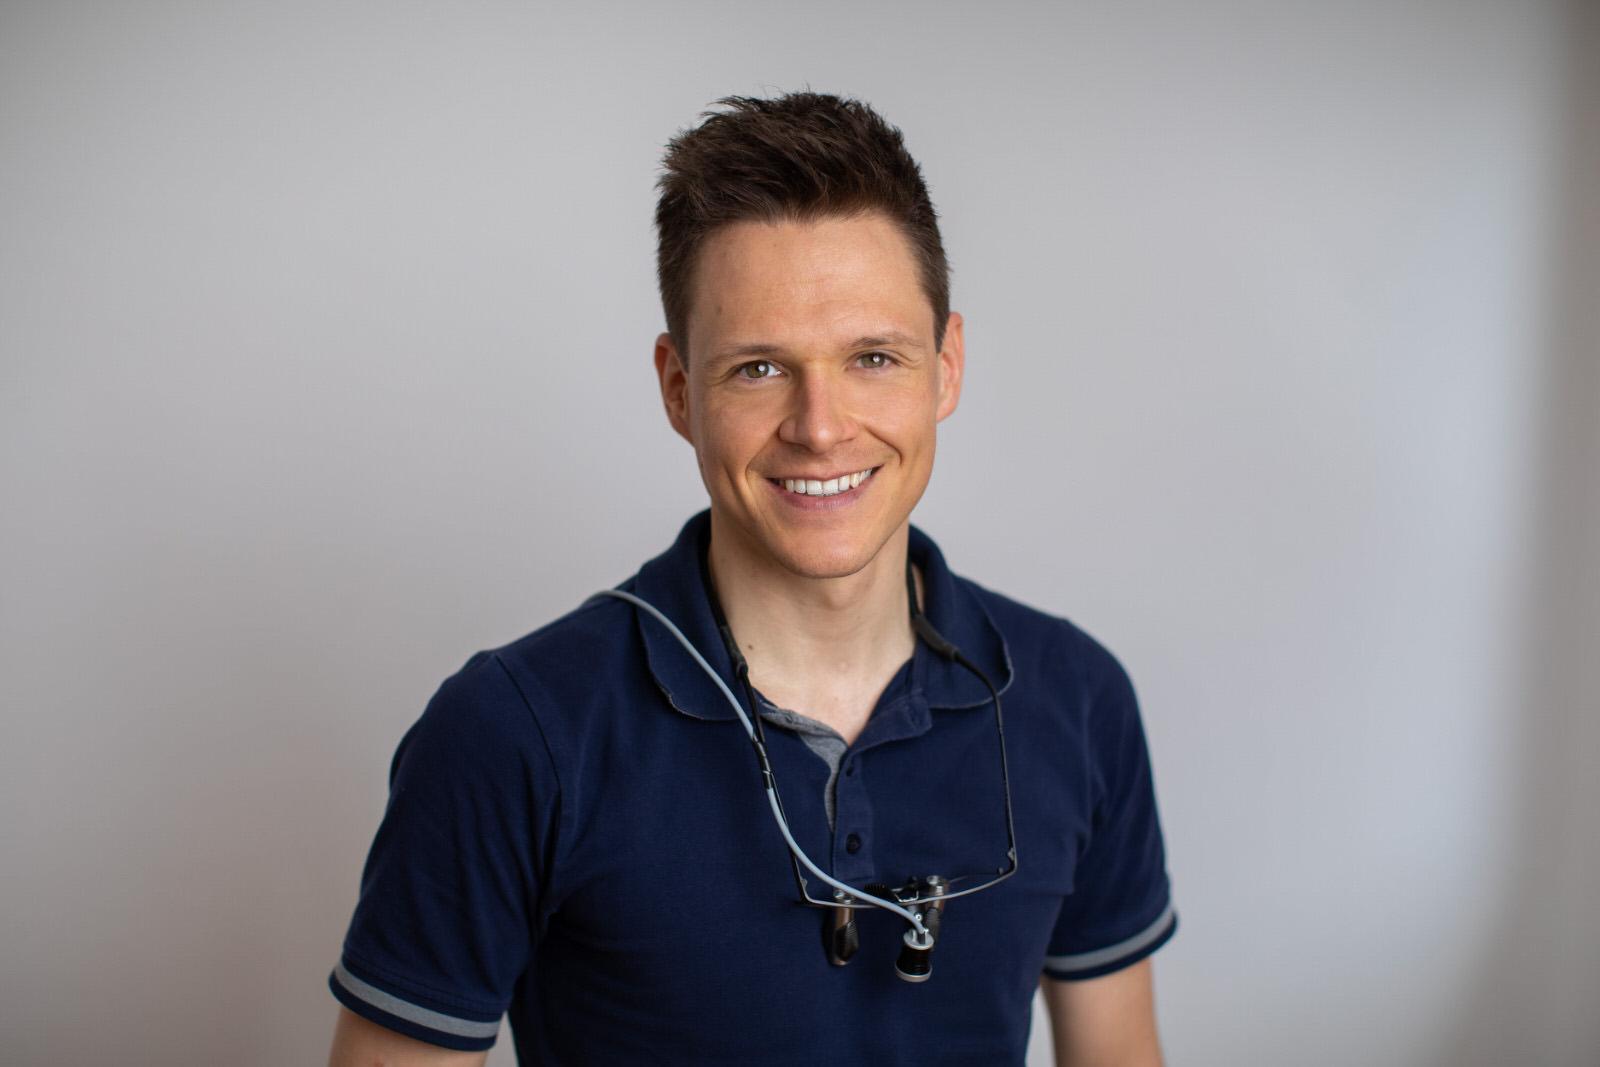 Dr. Matthias Mayr